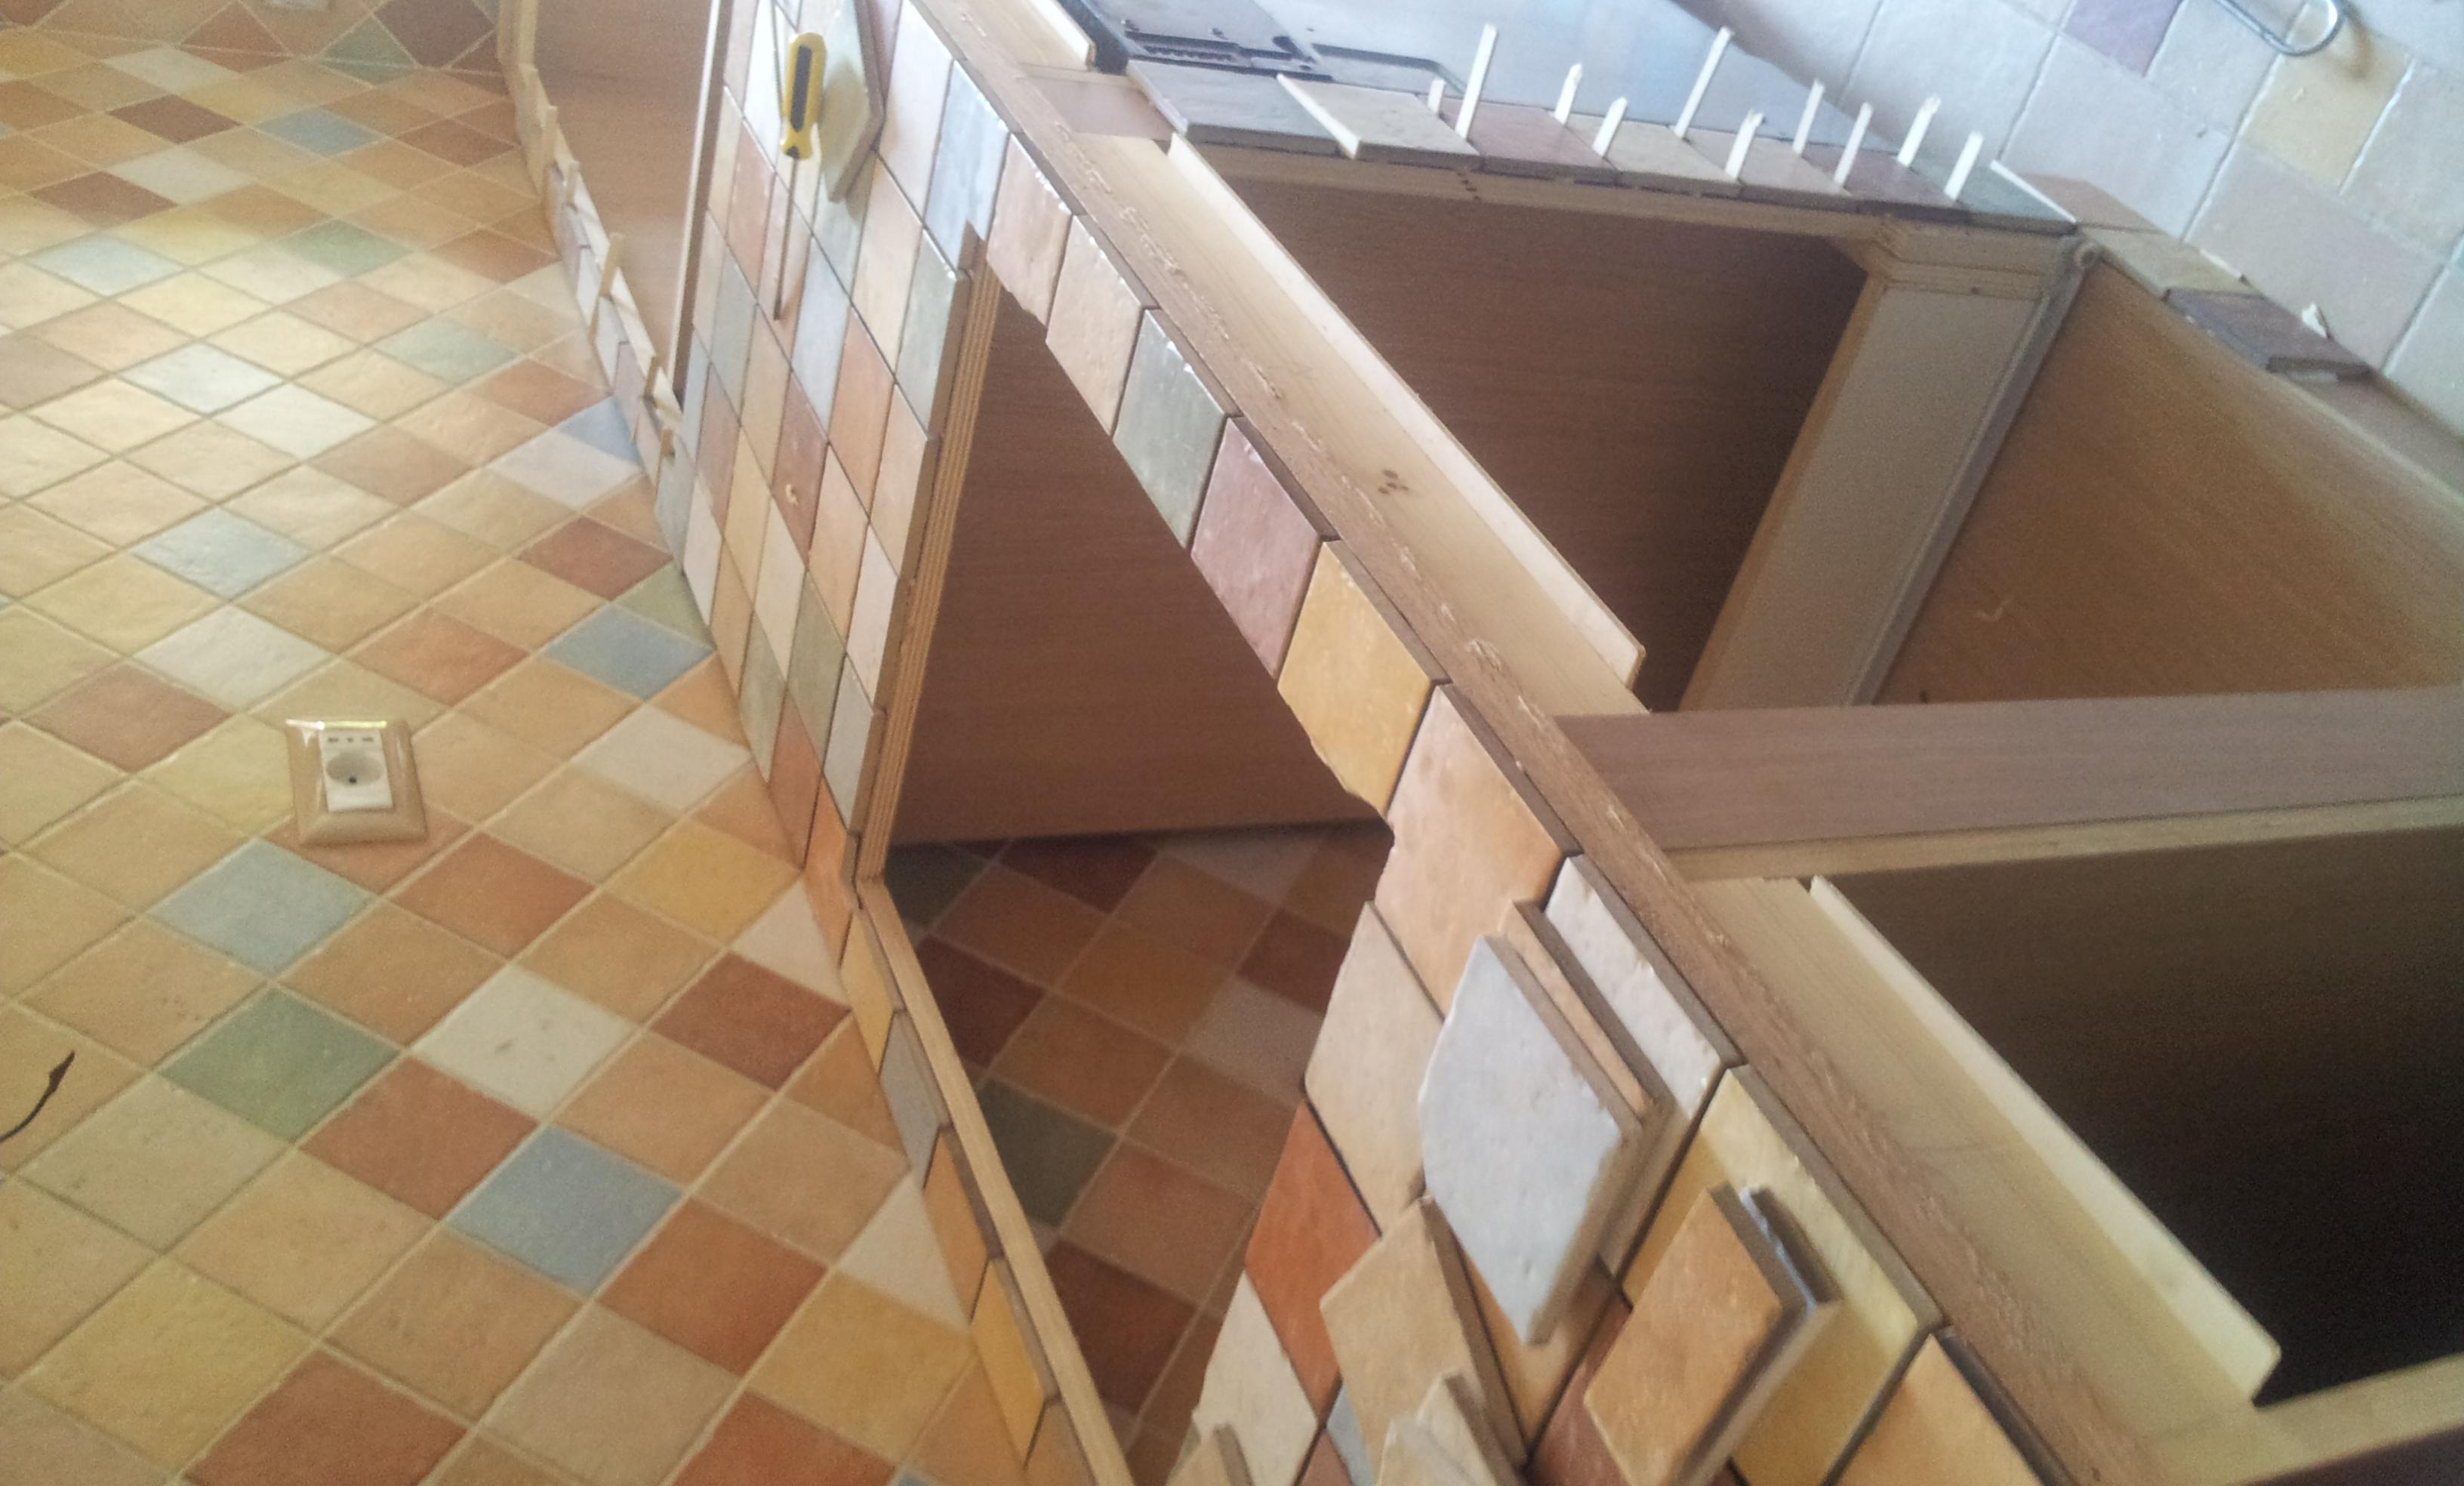 Cucina in legno in costruzione falegnameria roma - Restauro finestre in legno ...